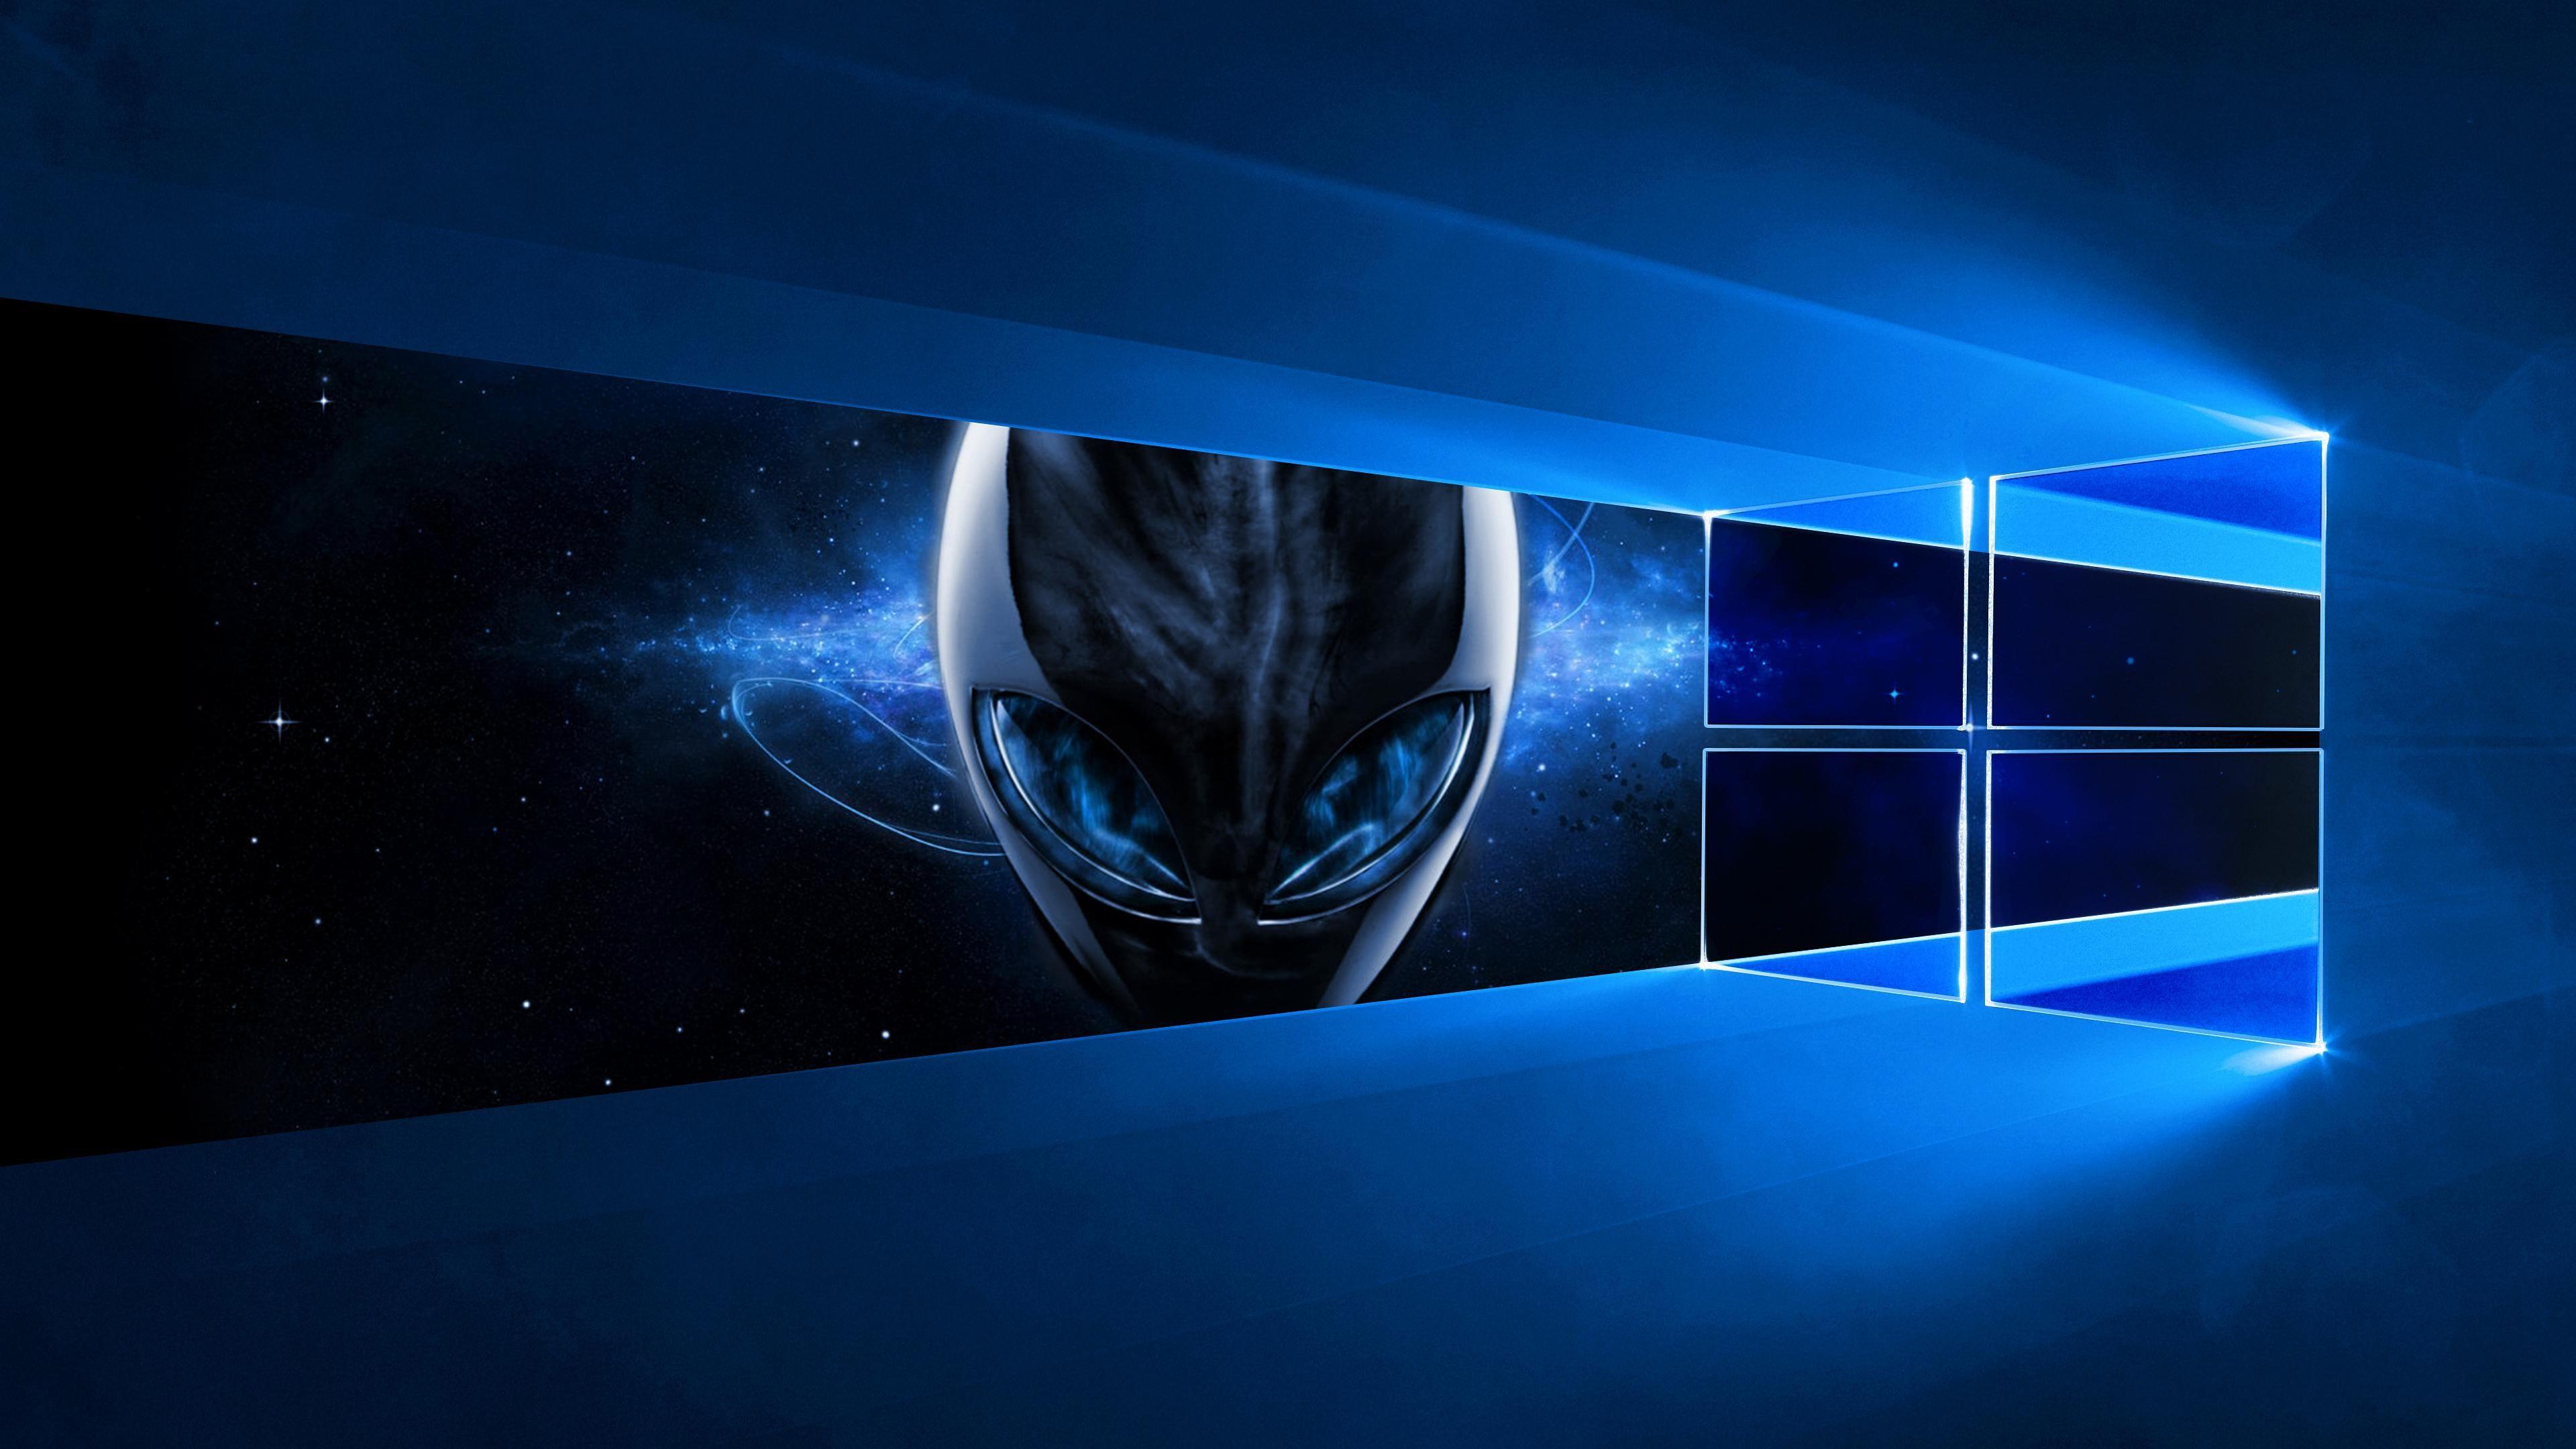 Windows 10 Alienware Wallpaper [3840x2160] - See more on Classy ...